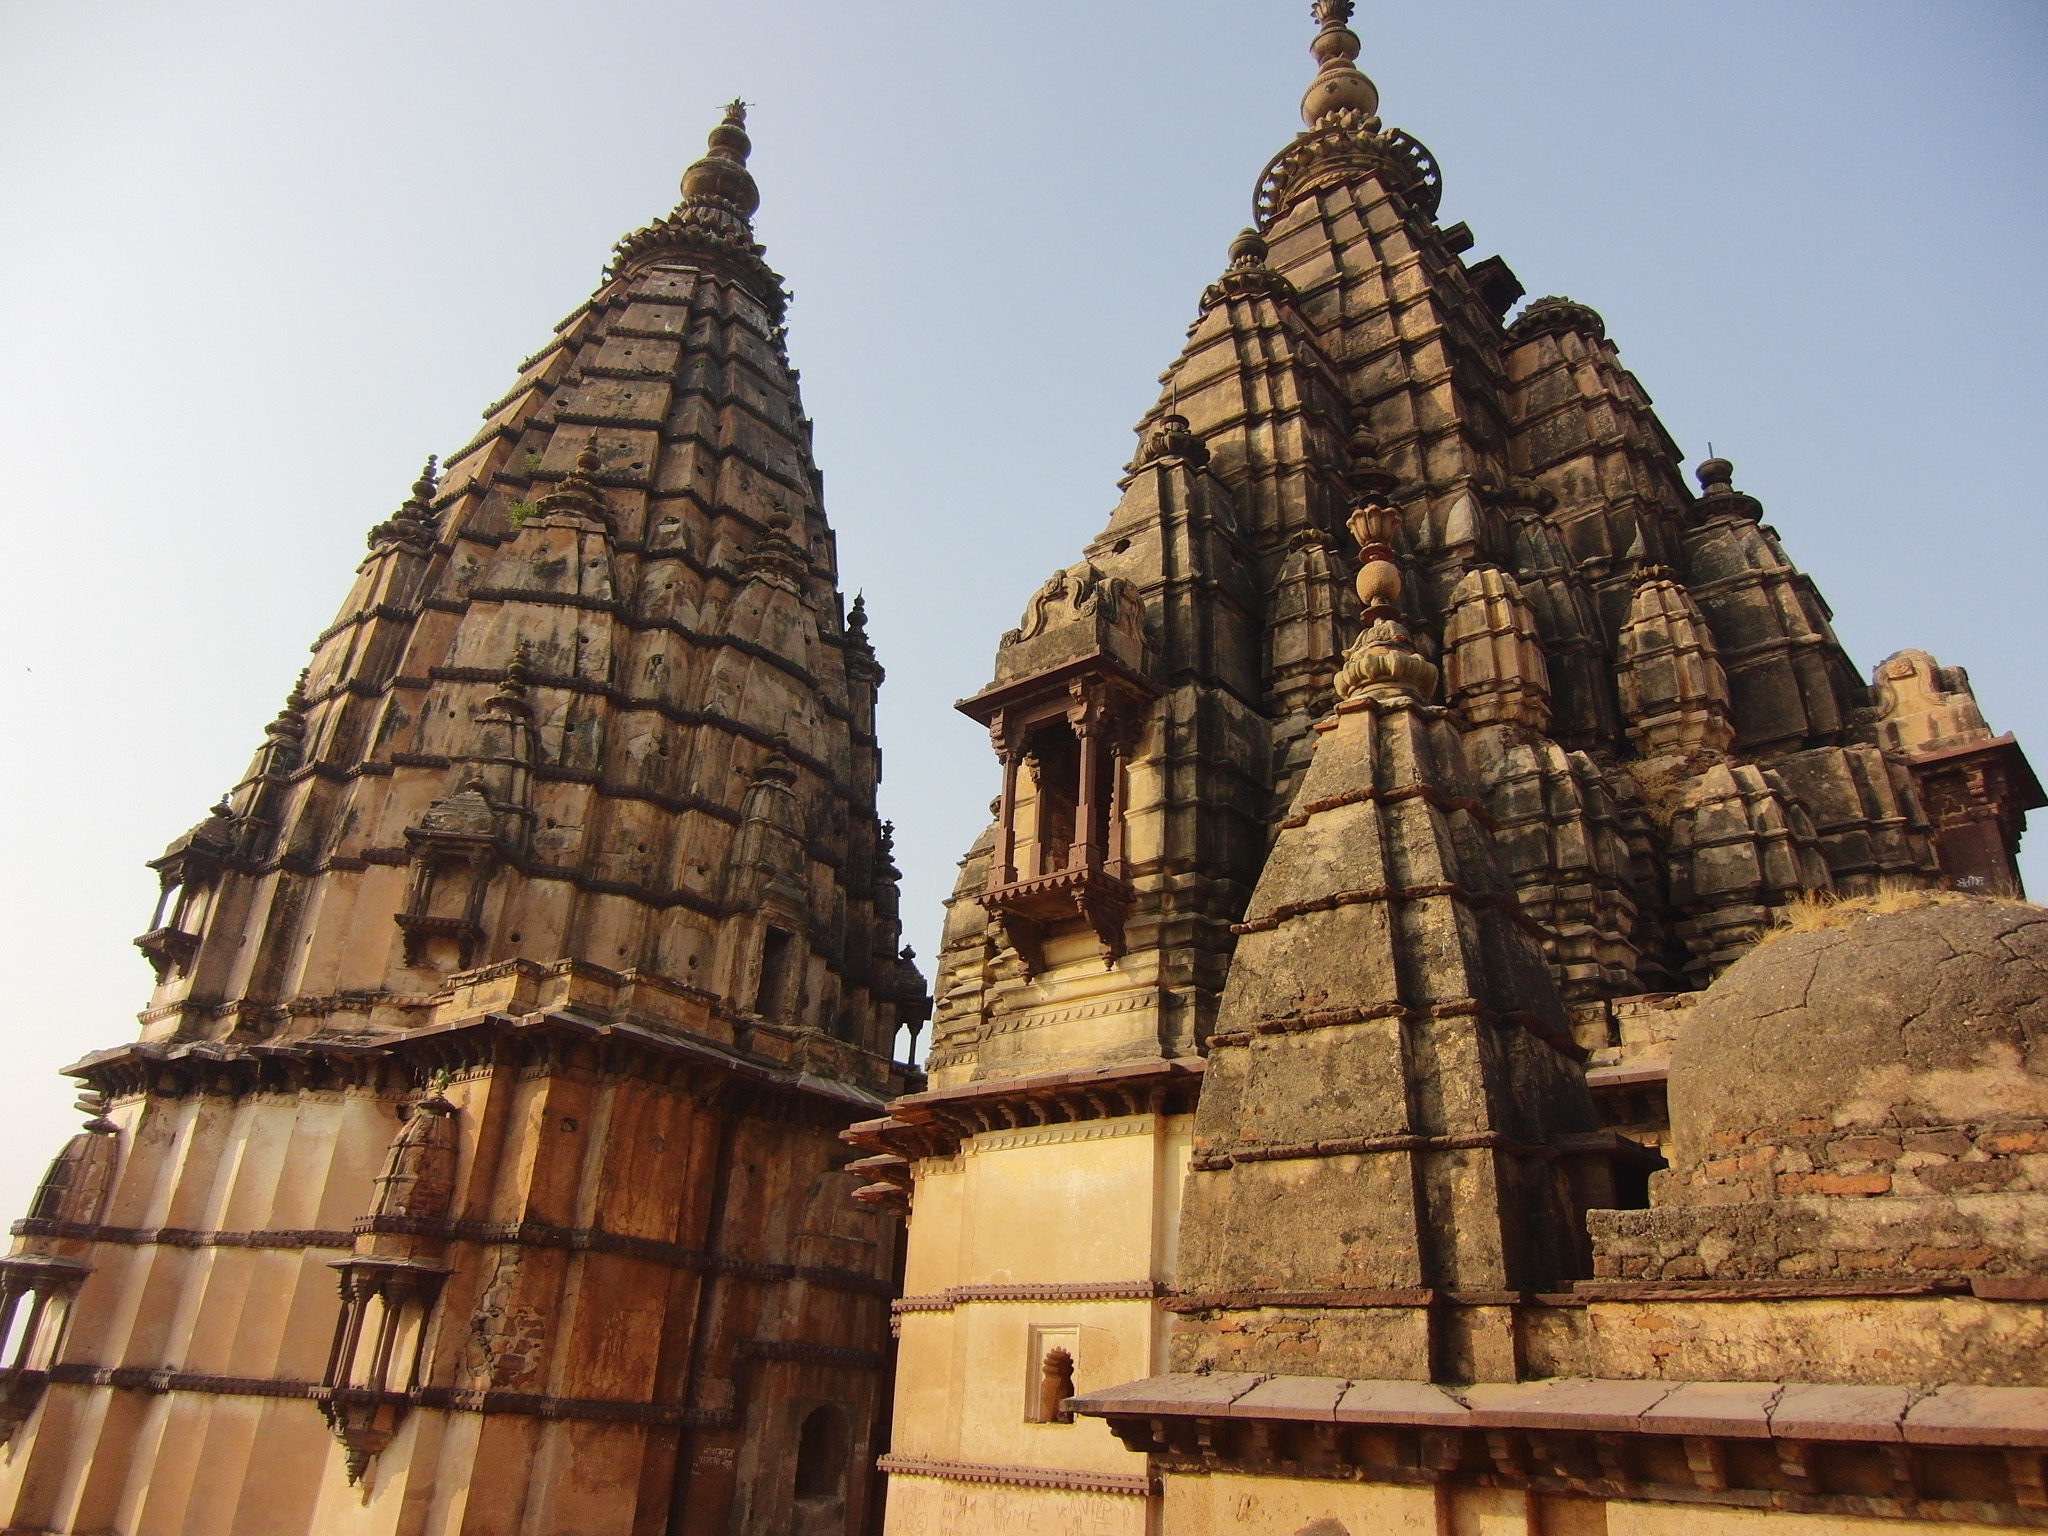 Chaturbhuj-Tempel